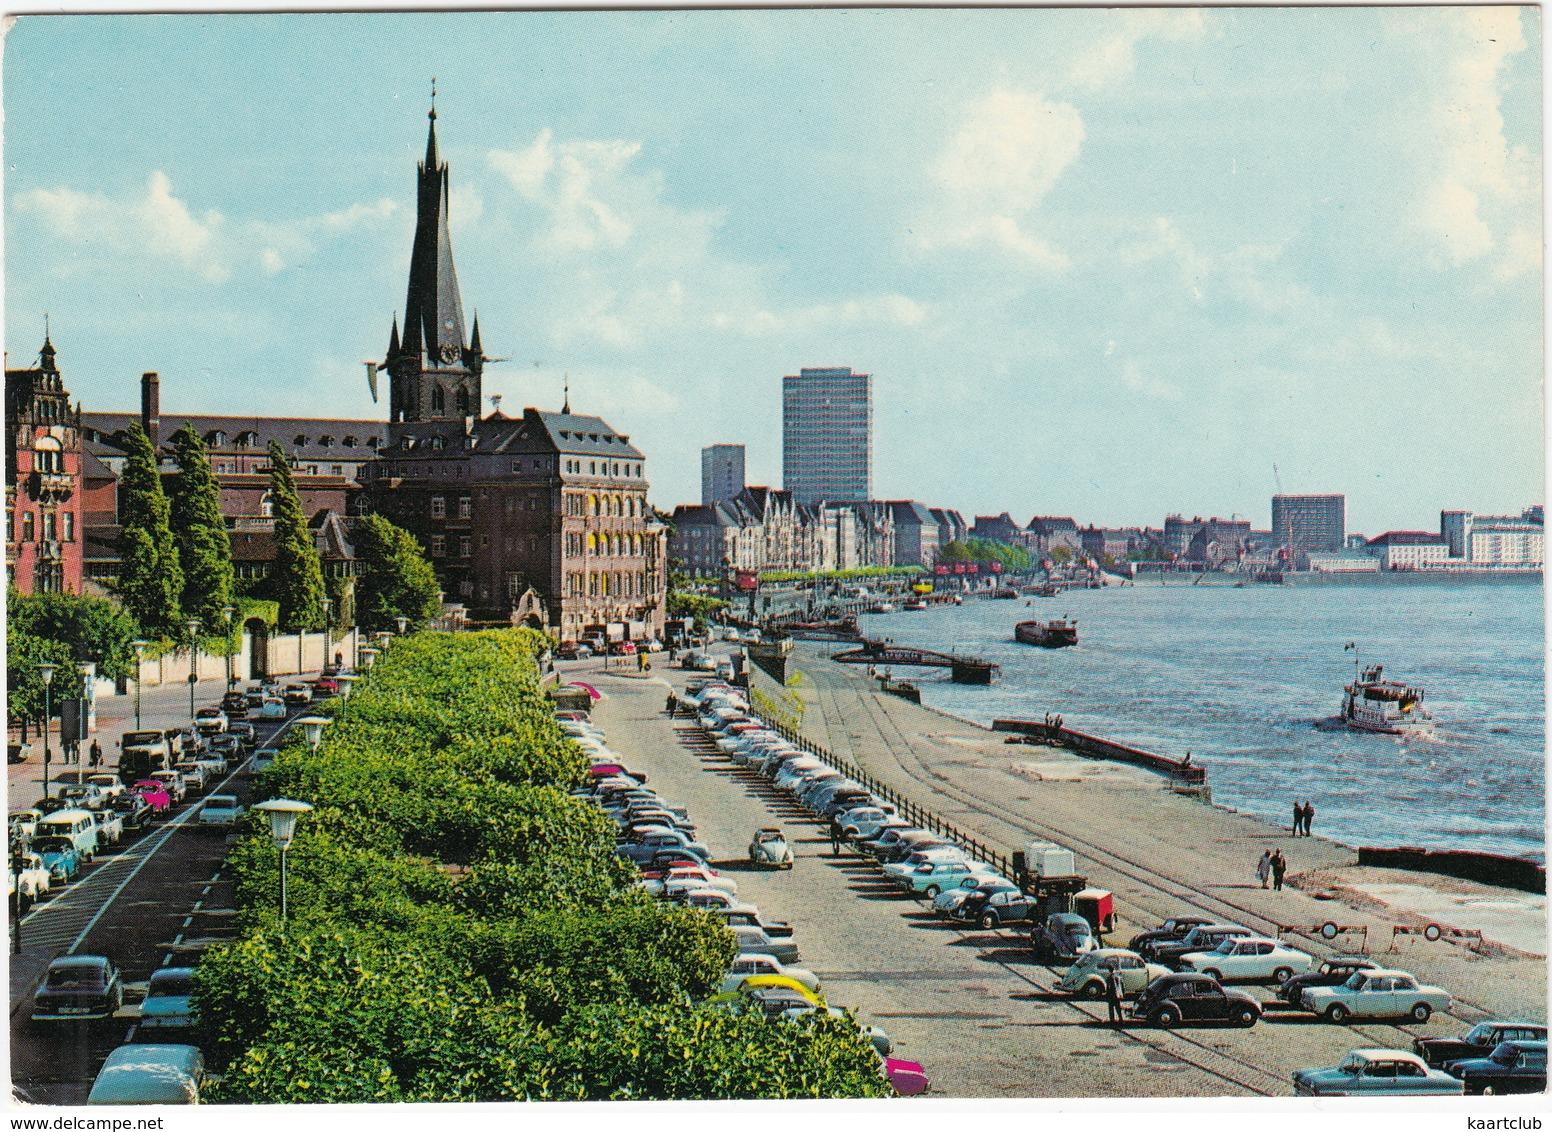 Düsseldorf: FORD STREIFENTAUNUS, 12M P4, OPEL KADETT-B KIEMEN COUPÉ, VW 1200 & CABRIO, KARMANN GHIA, MERCEDES W110/11 - Toerisme